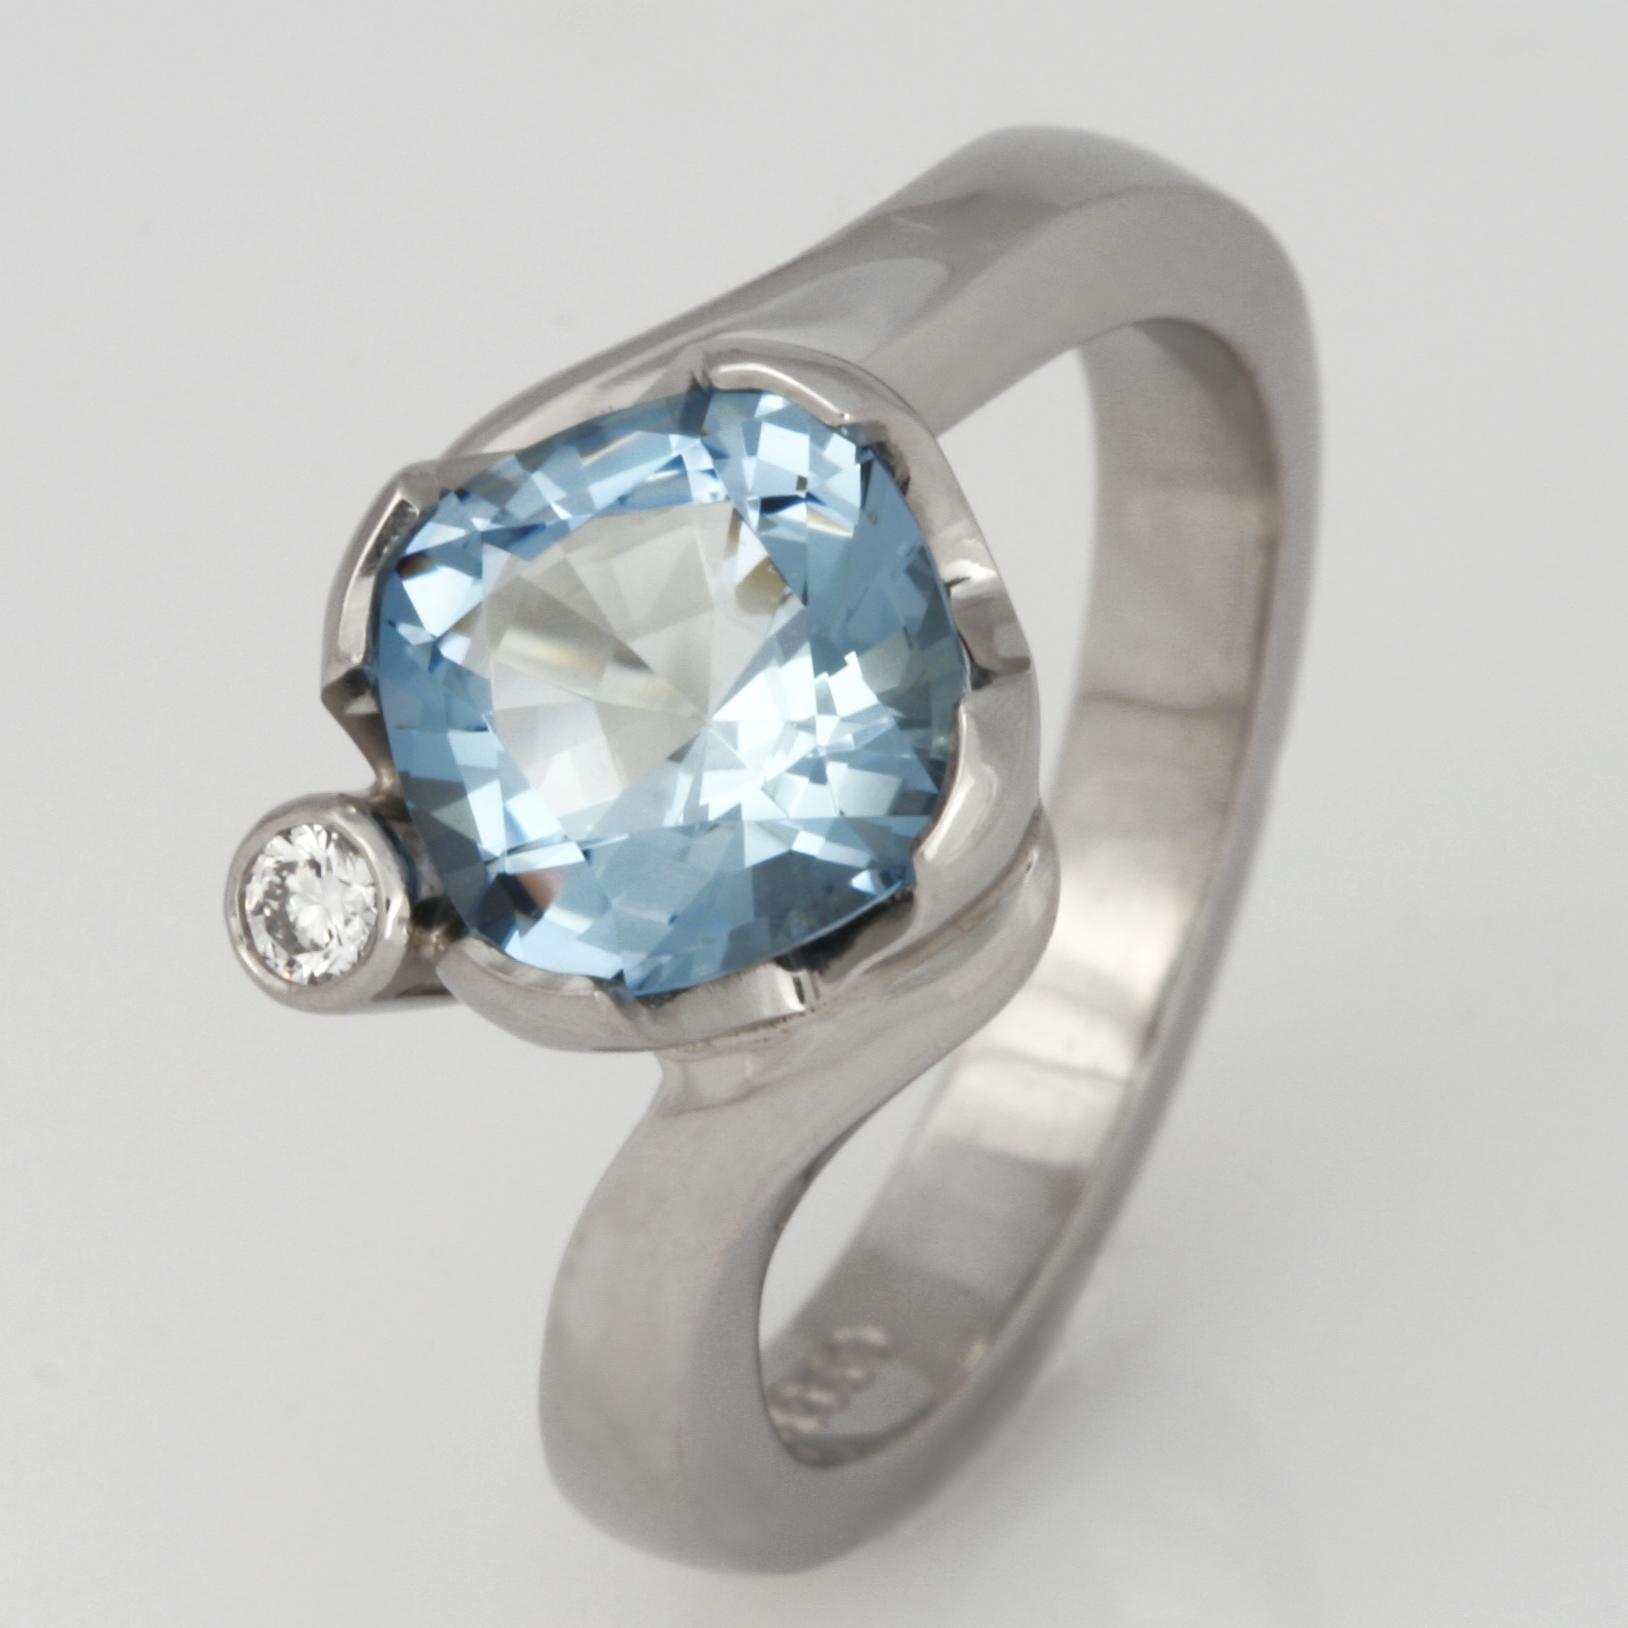 Handmade ladies palladium aquamarine and diamond engagement ring